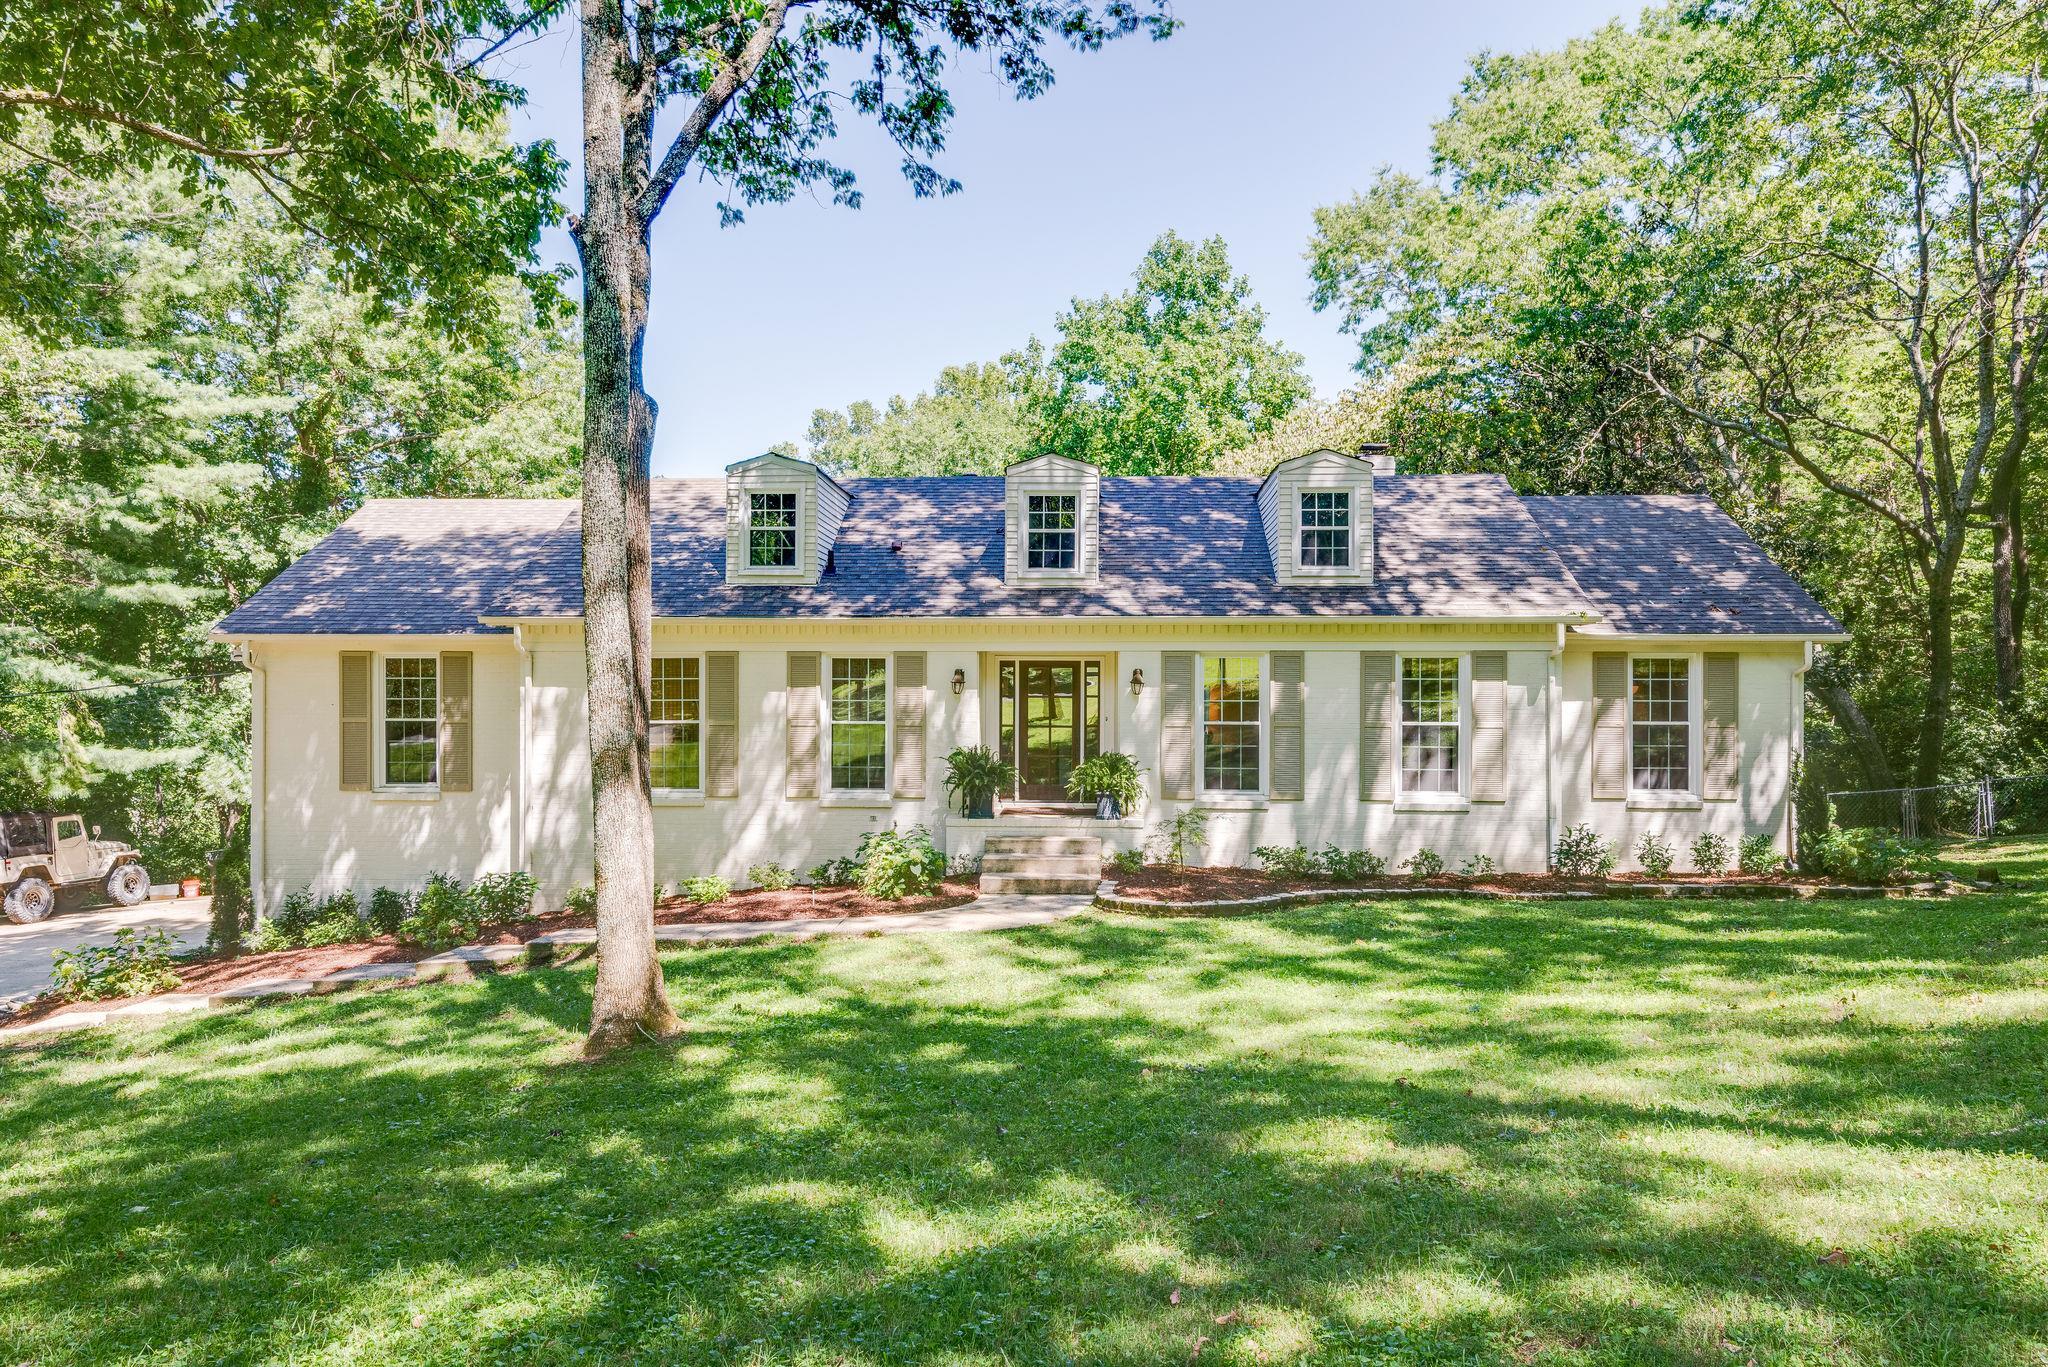 113 Featherstone Dr, Franklin, TN 37069 - Franklin, TN real estate listing